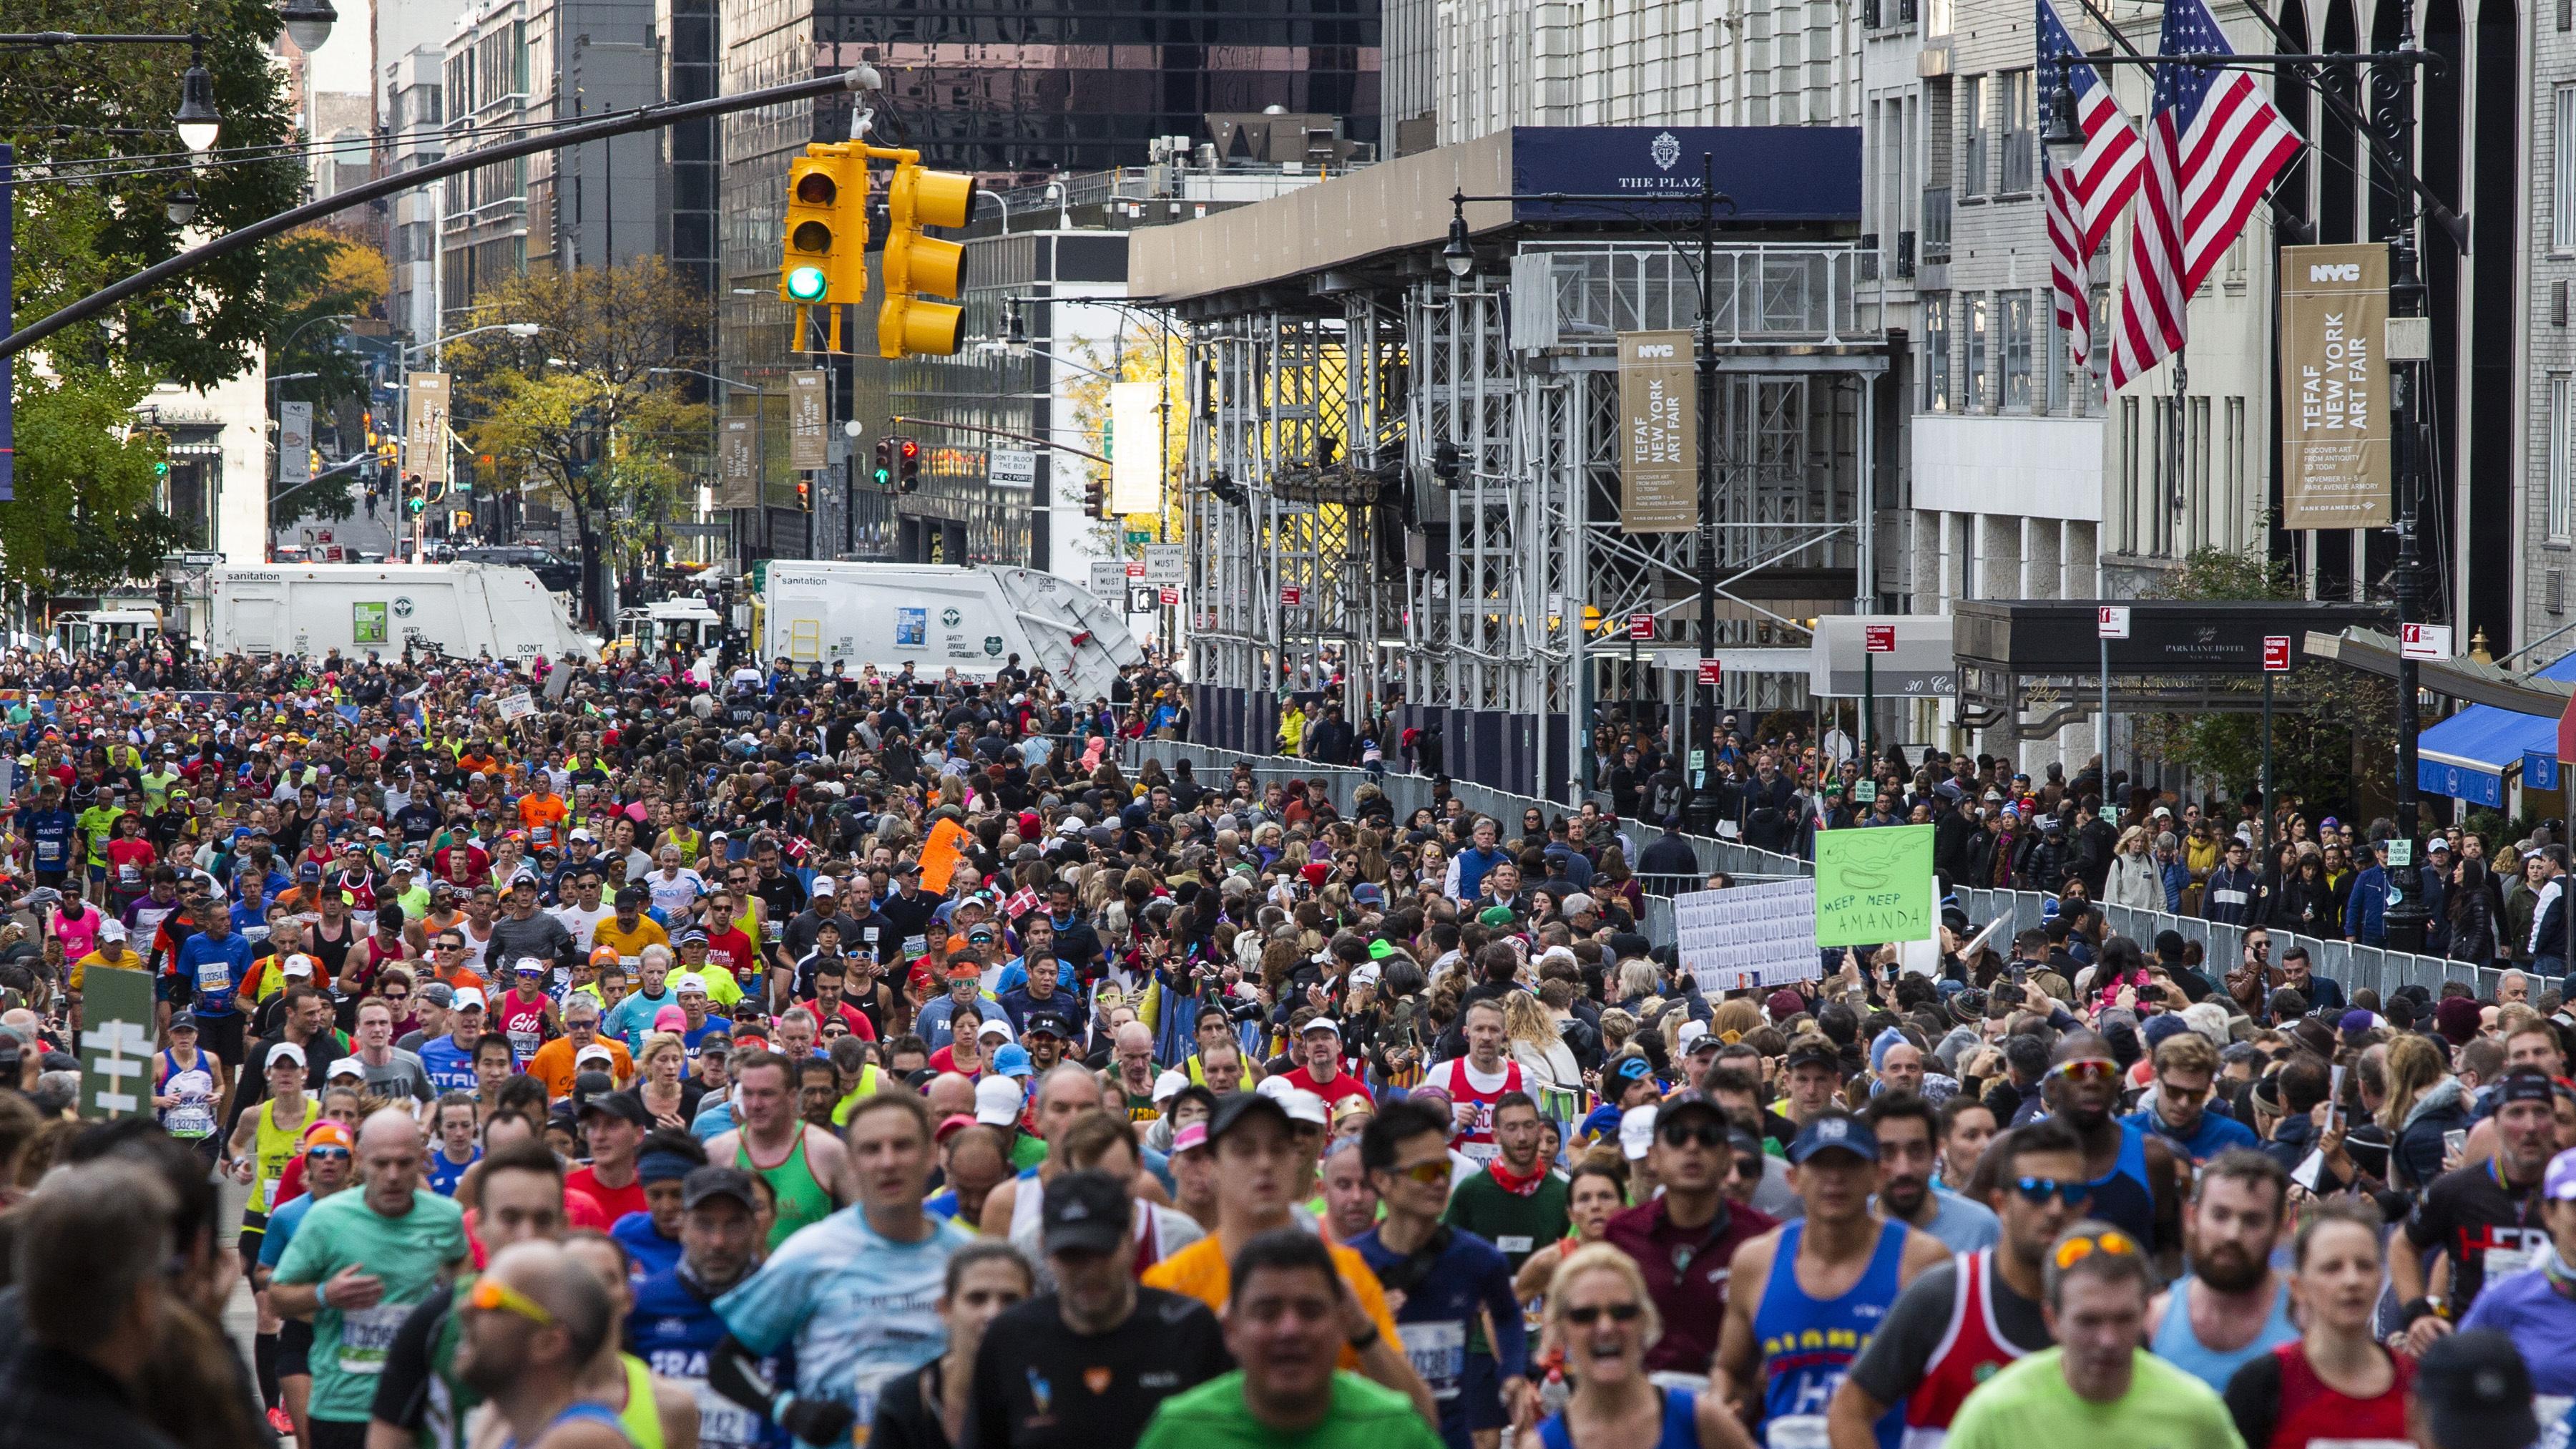 New York City Marathon Canceled Due To Coronavirus Pandemic